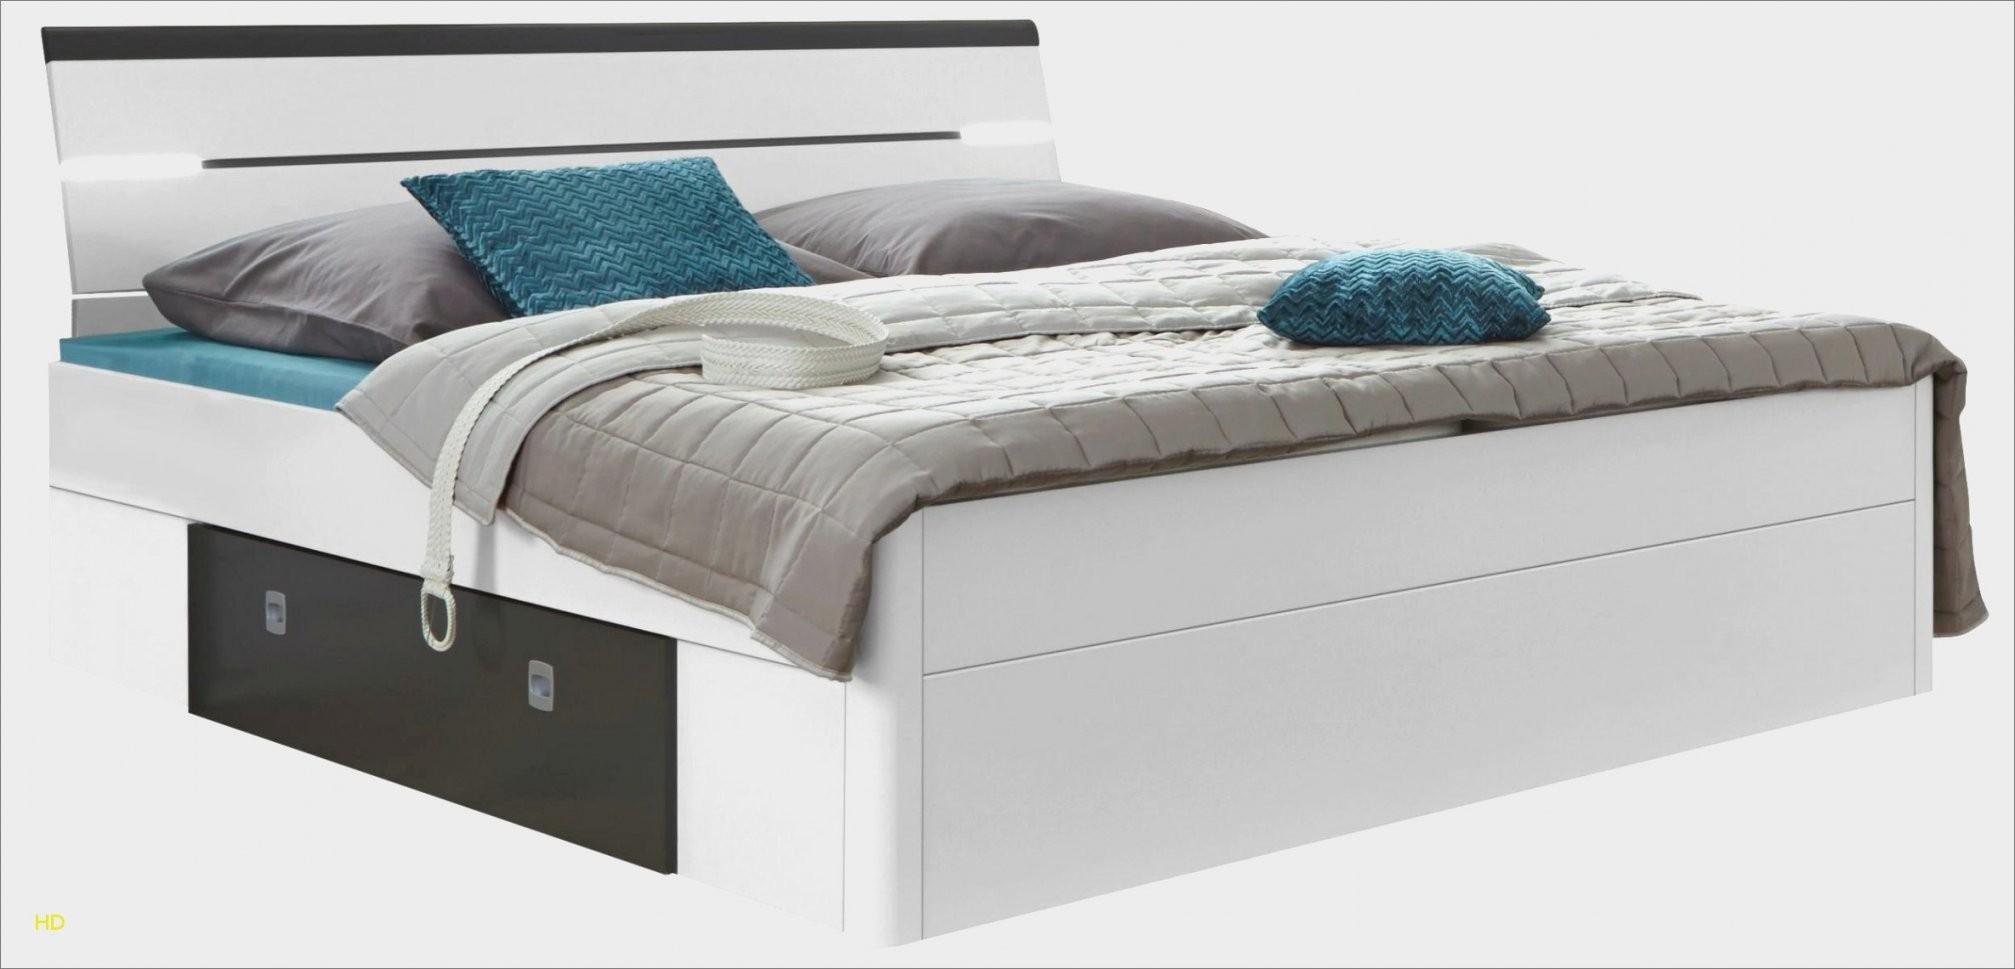 Ikea Lattenbodem 140X200 Liefelijk 20 Fresh Bett 140X200 Inkl von Bett 140X200 Inkl Lattenrost Matratze Photo